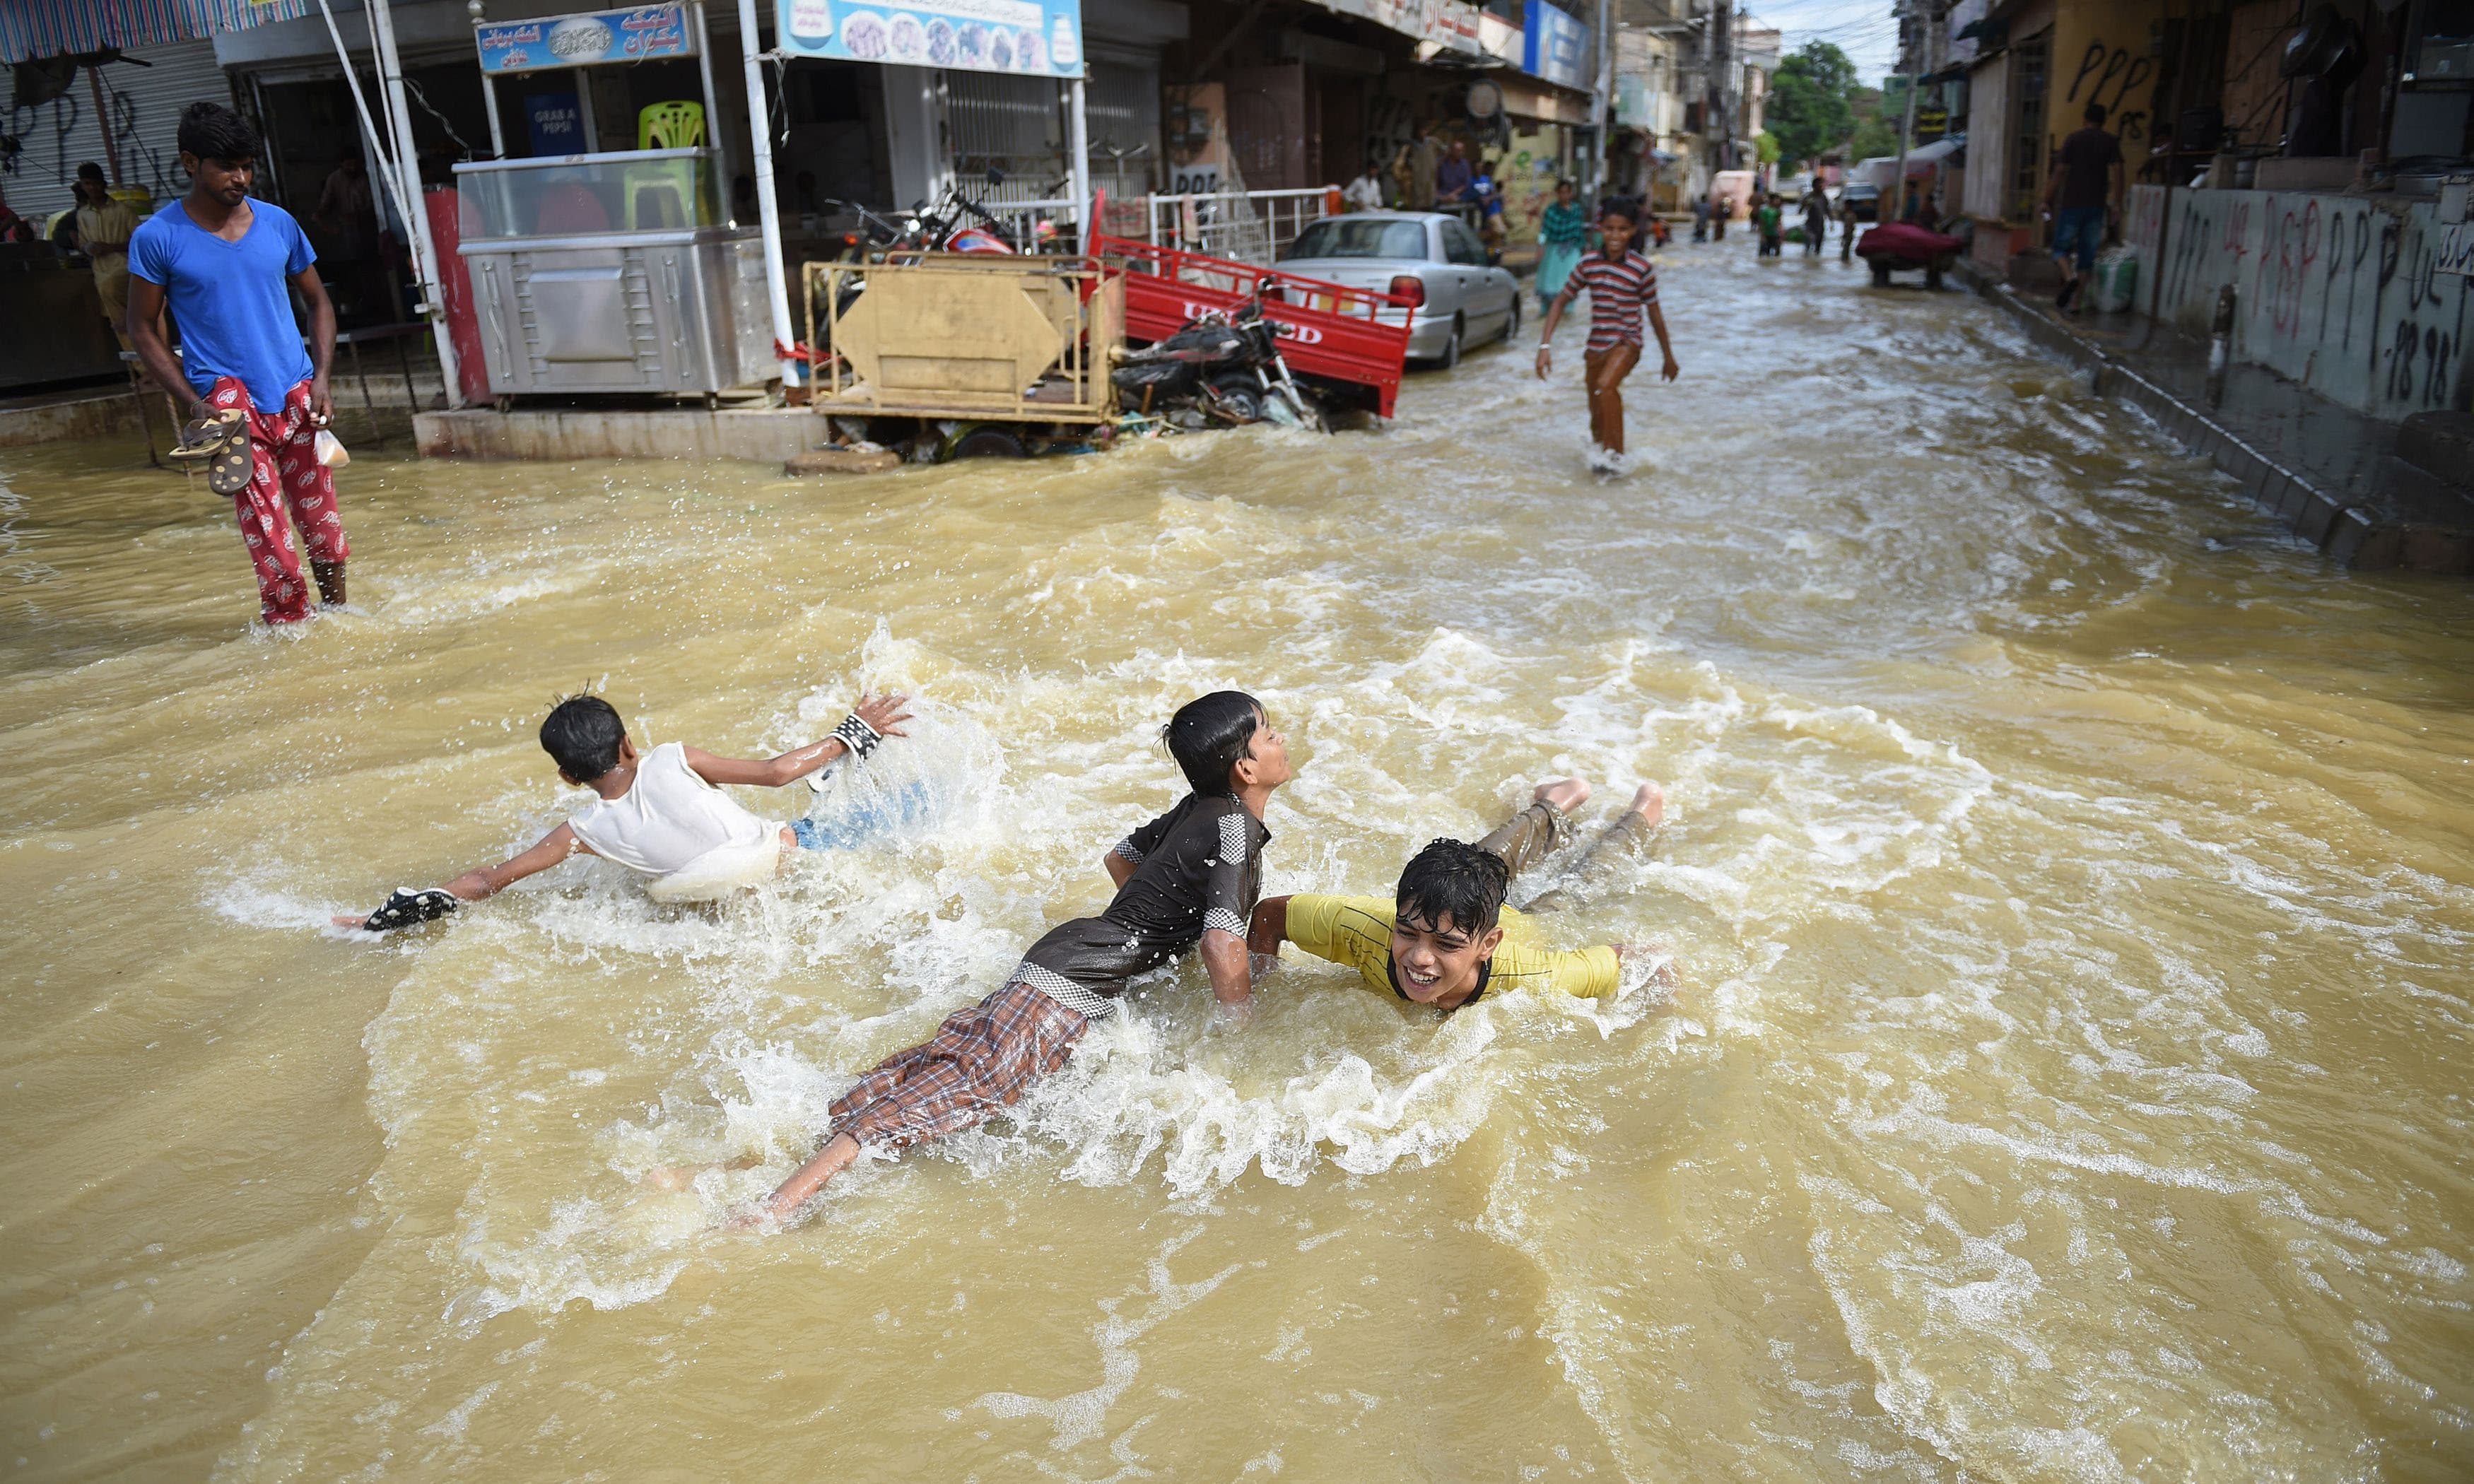 23 killed as monsoon rains lash Karachi - Pakistan - DAWN COM